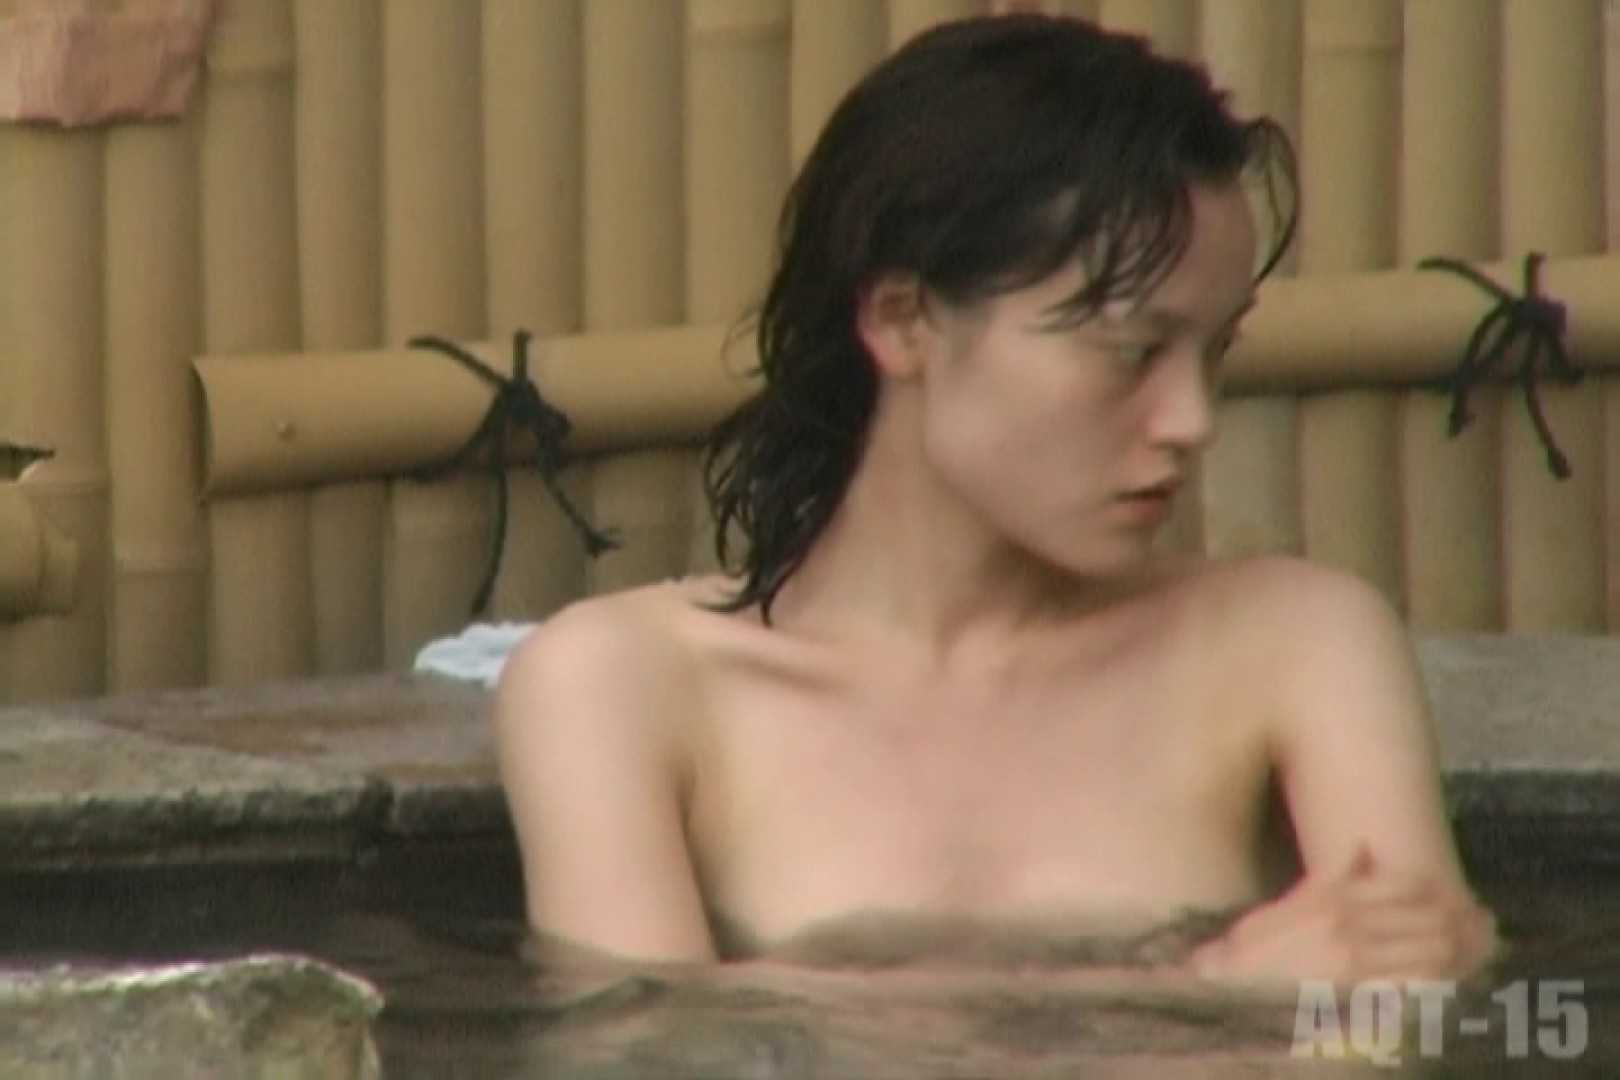 Aquaな露天風呂Vol.836 OL女体  98連発 90